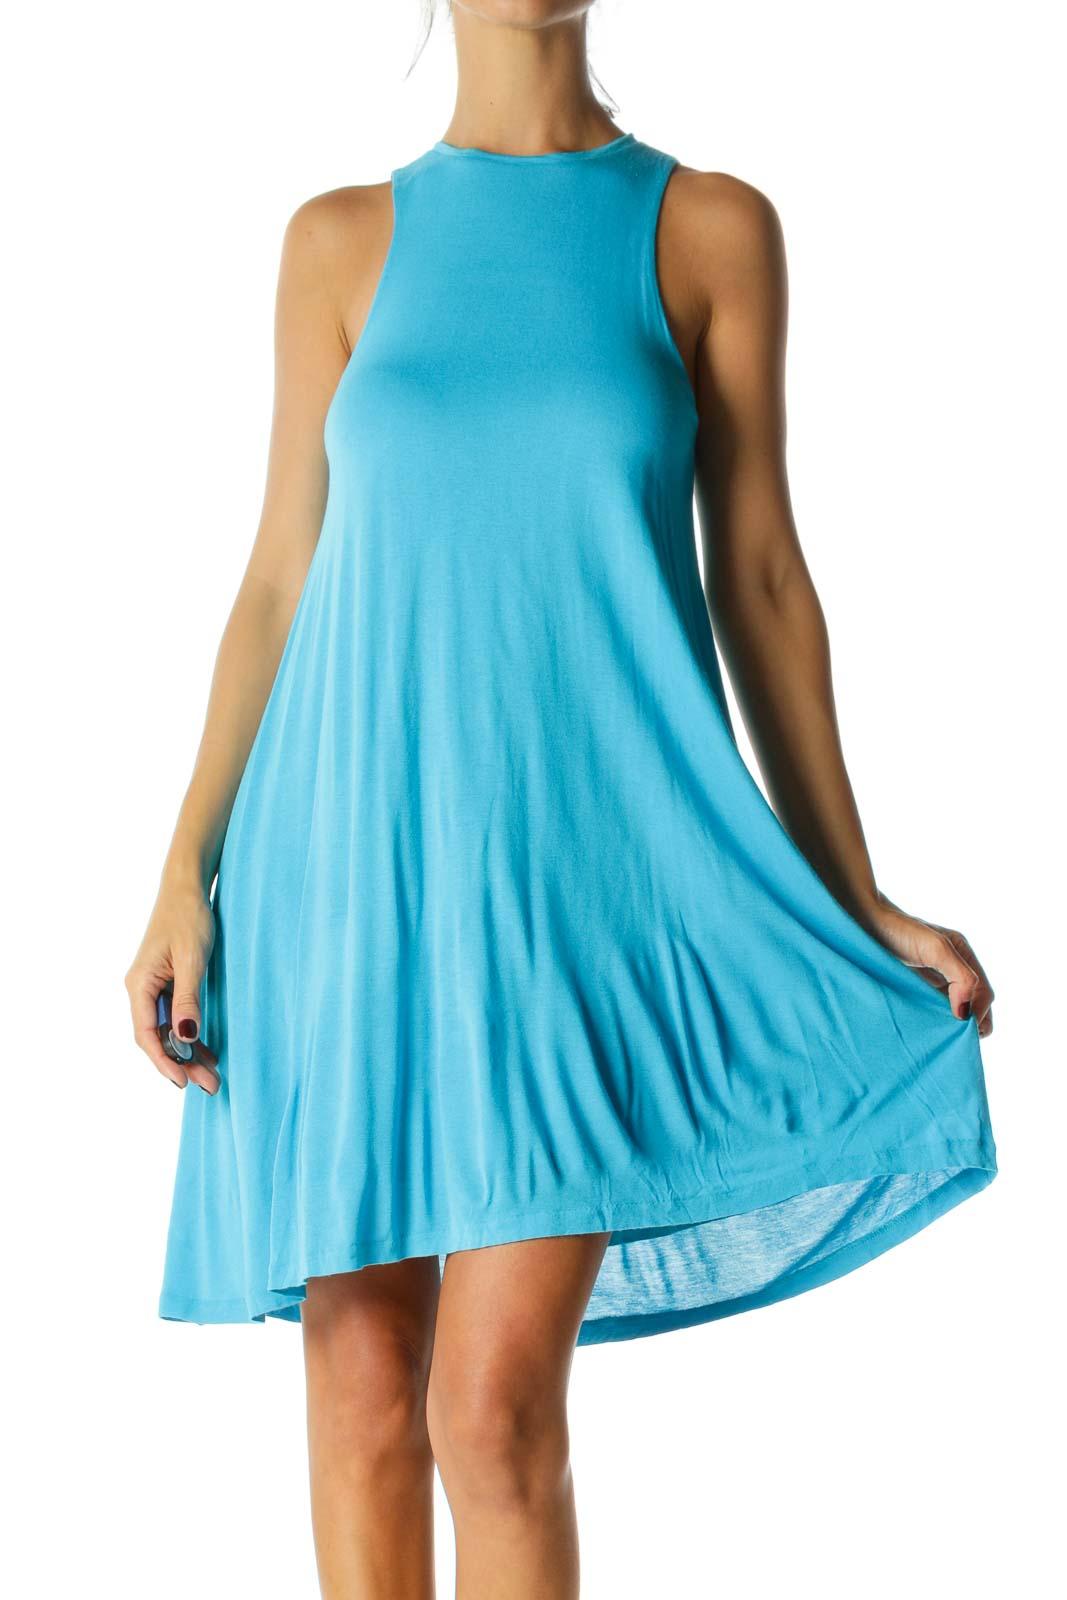 Blue High Round Neck Sleeveless Lined Jersey Knit Day Dress